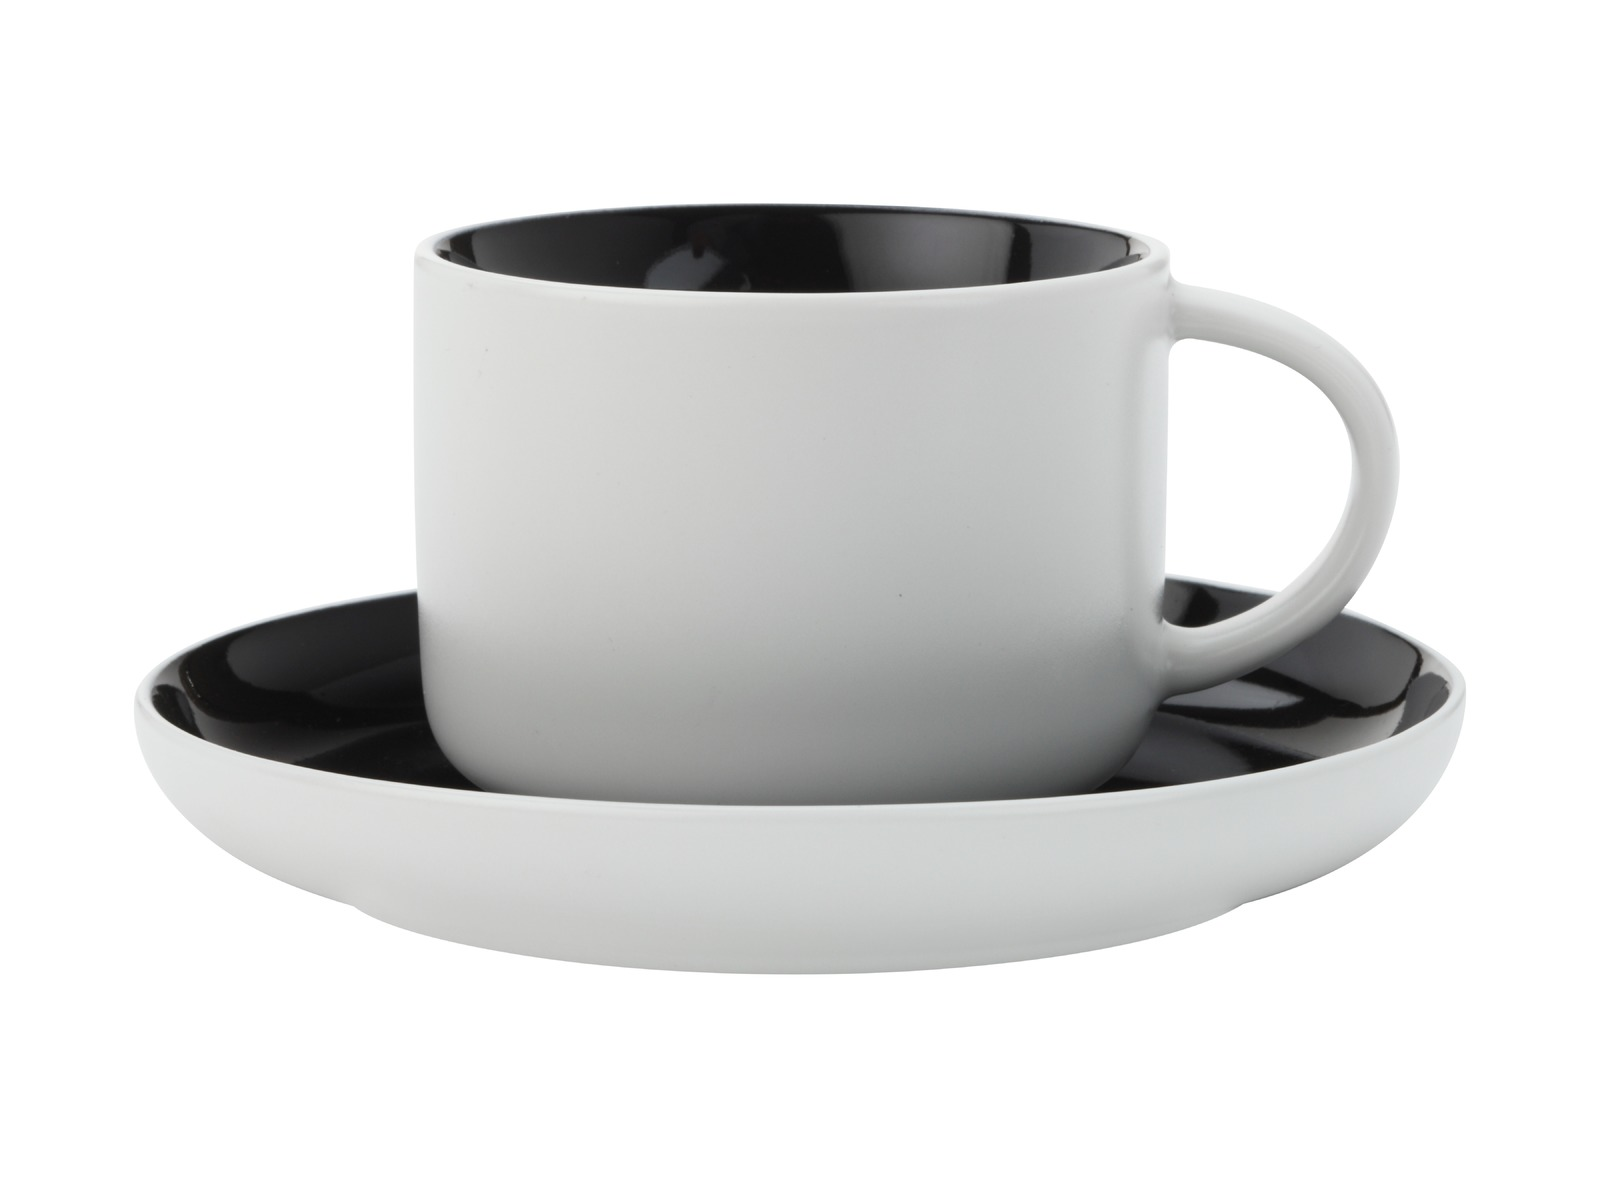 Maxwell & Williams - Tint Tea Cup & Saucer Black (250ml) image